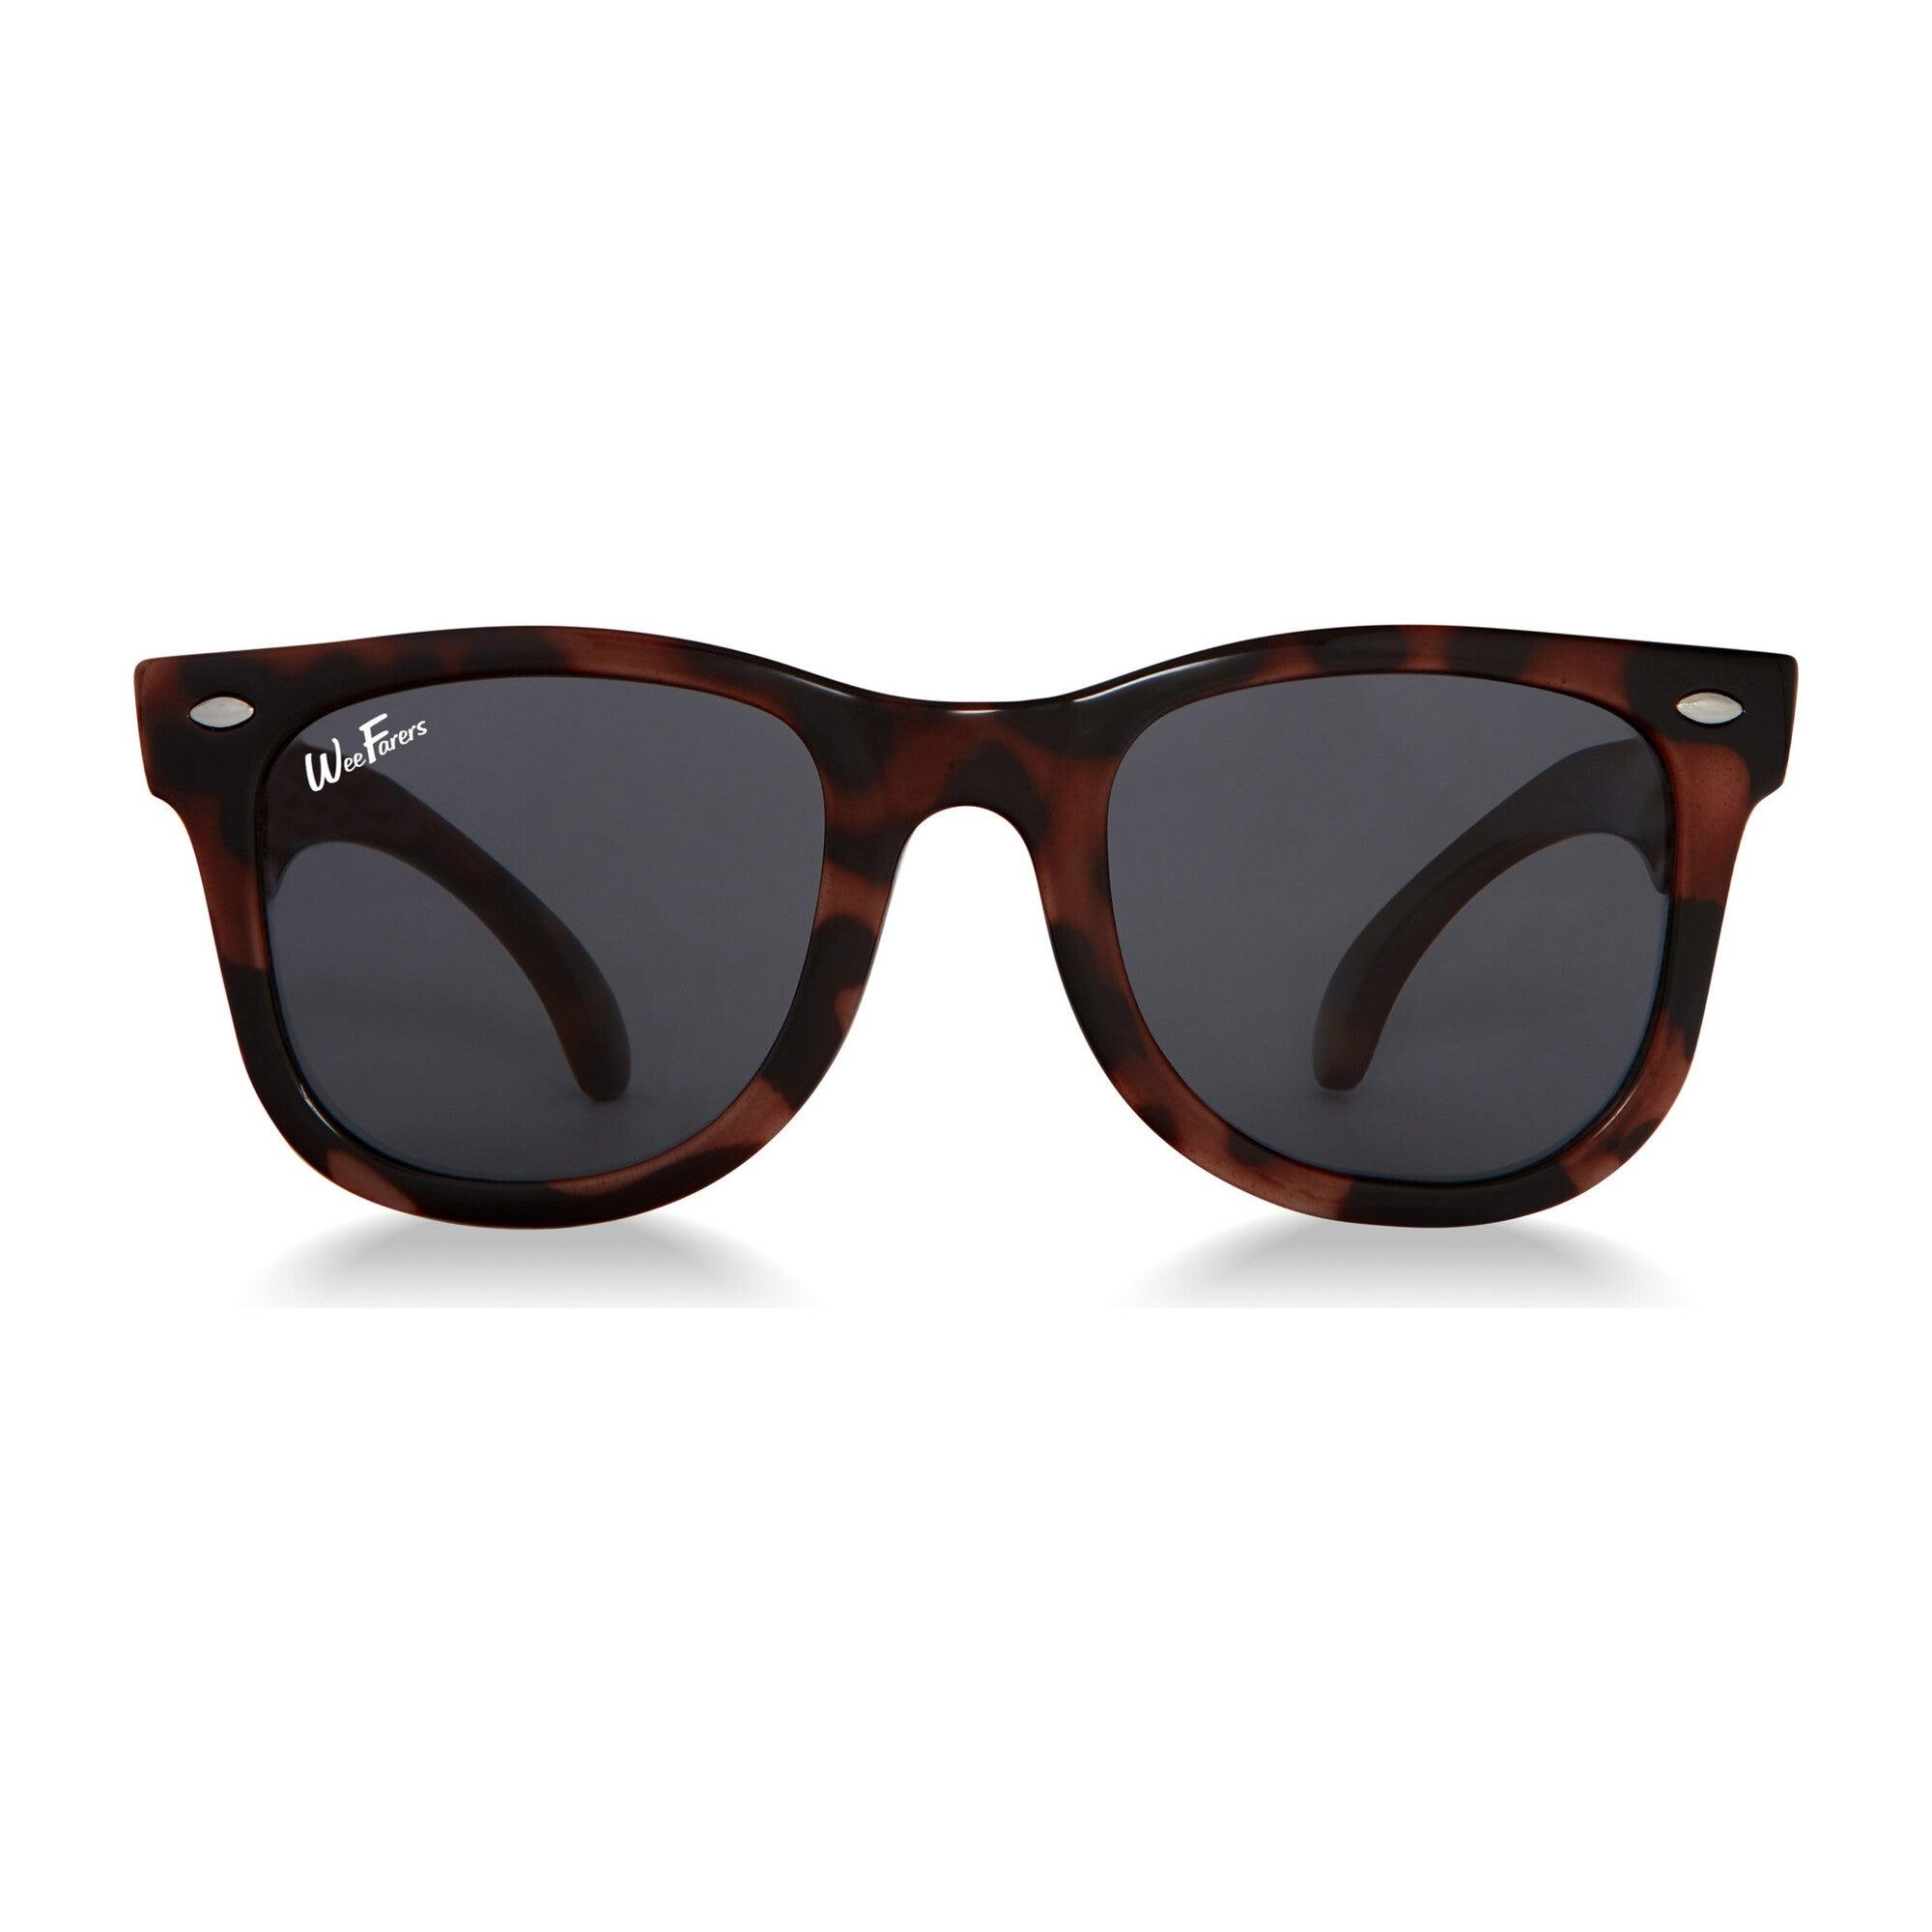 Polarized Sunglasses, Tortoise Shell